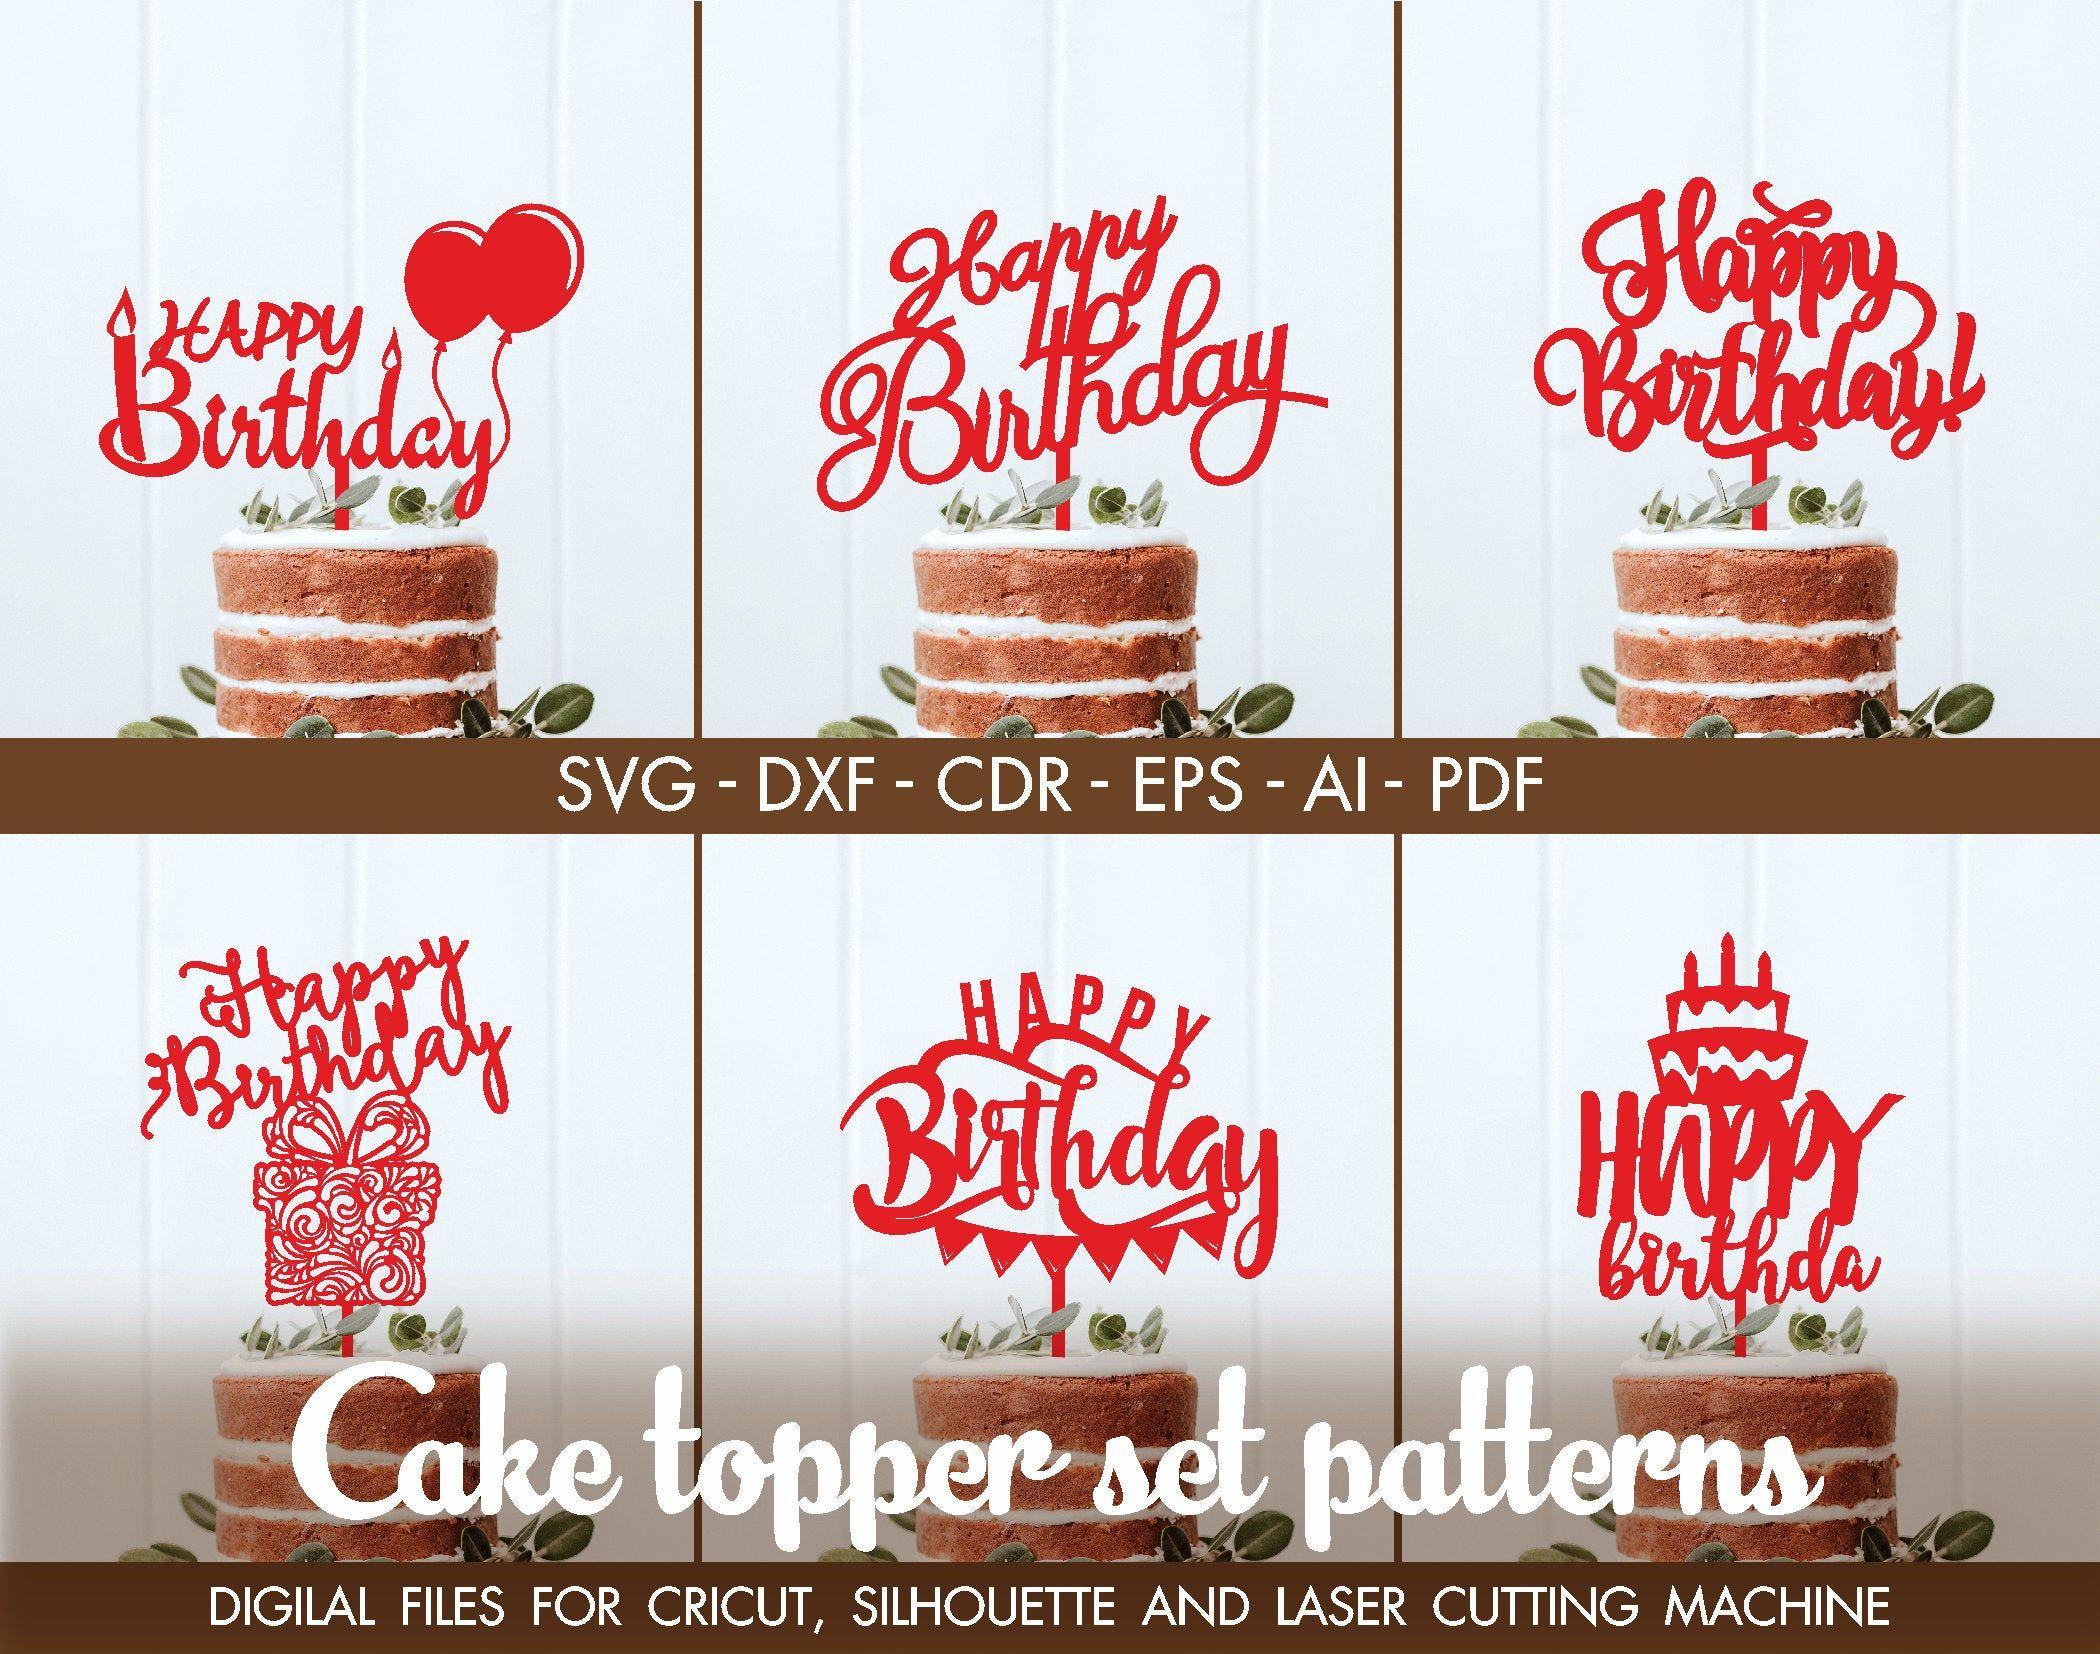 CNC Digital File SVG Silhouette Cut File Heart Cake Topper Template Heart Vector Laser Cut Cake Topper Decor for Cake Vector Template